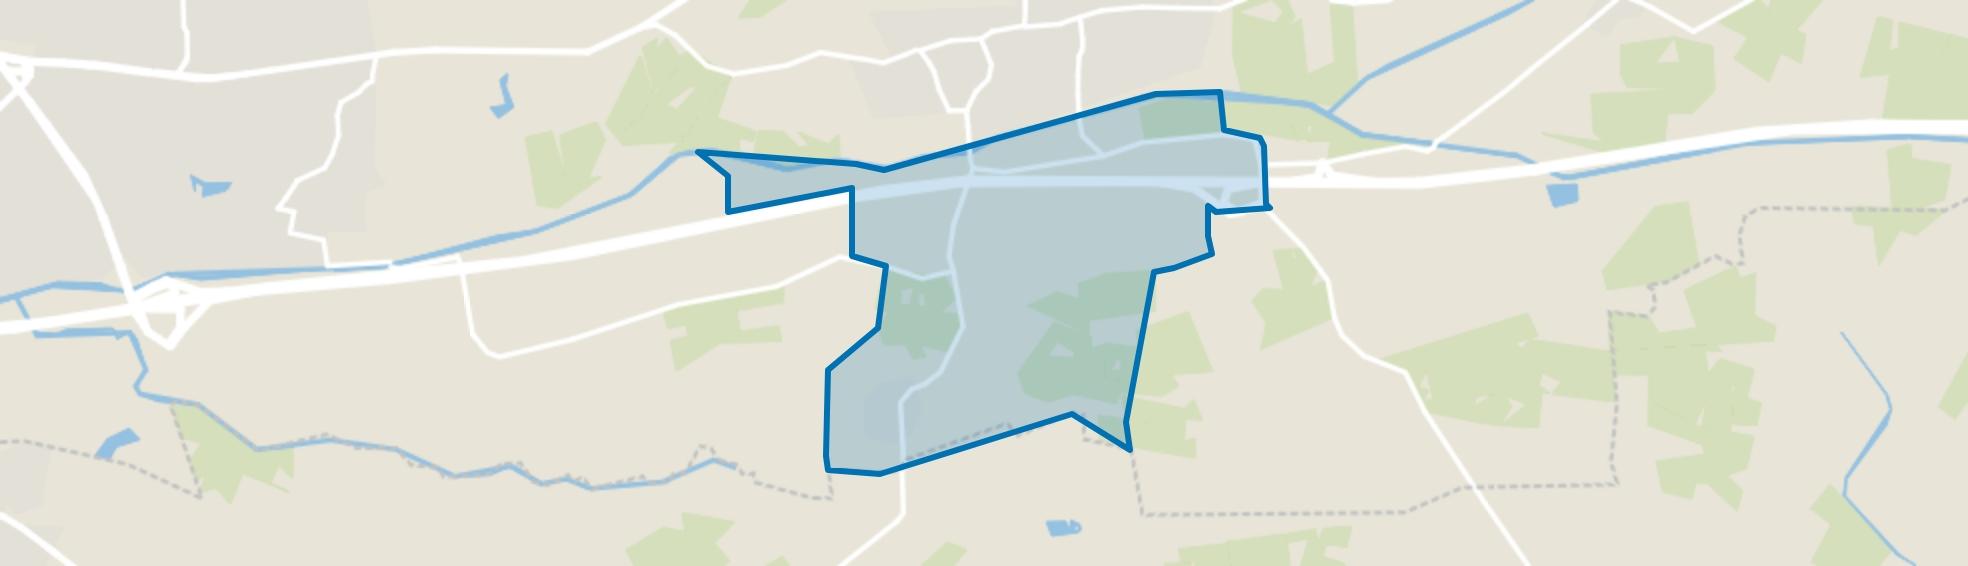 Dortherhoek, Bathmen map